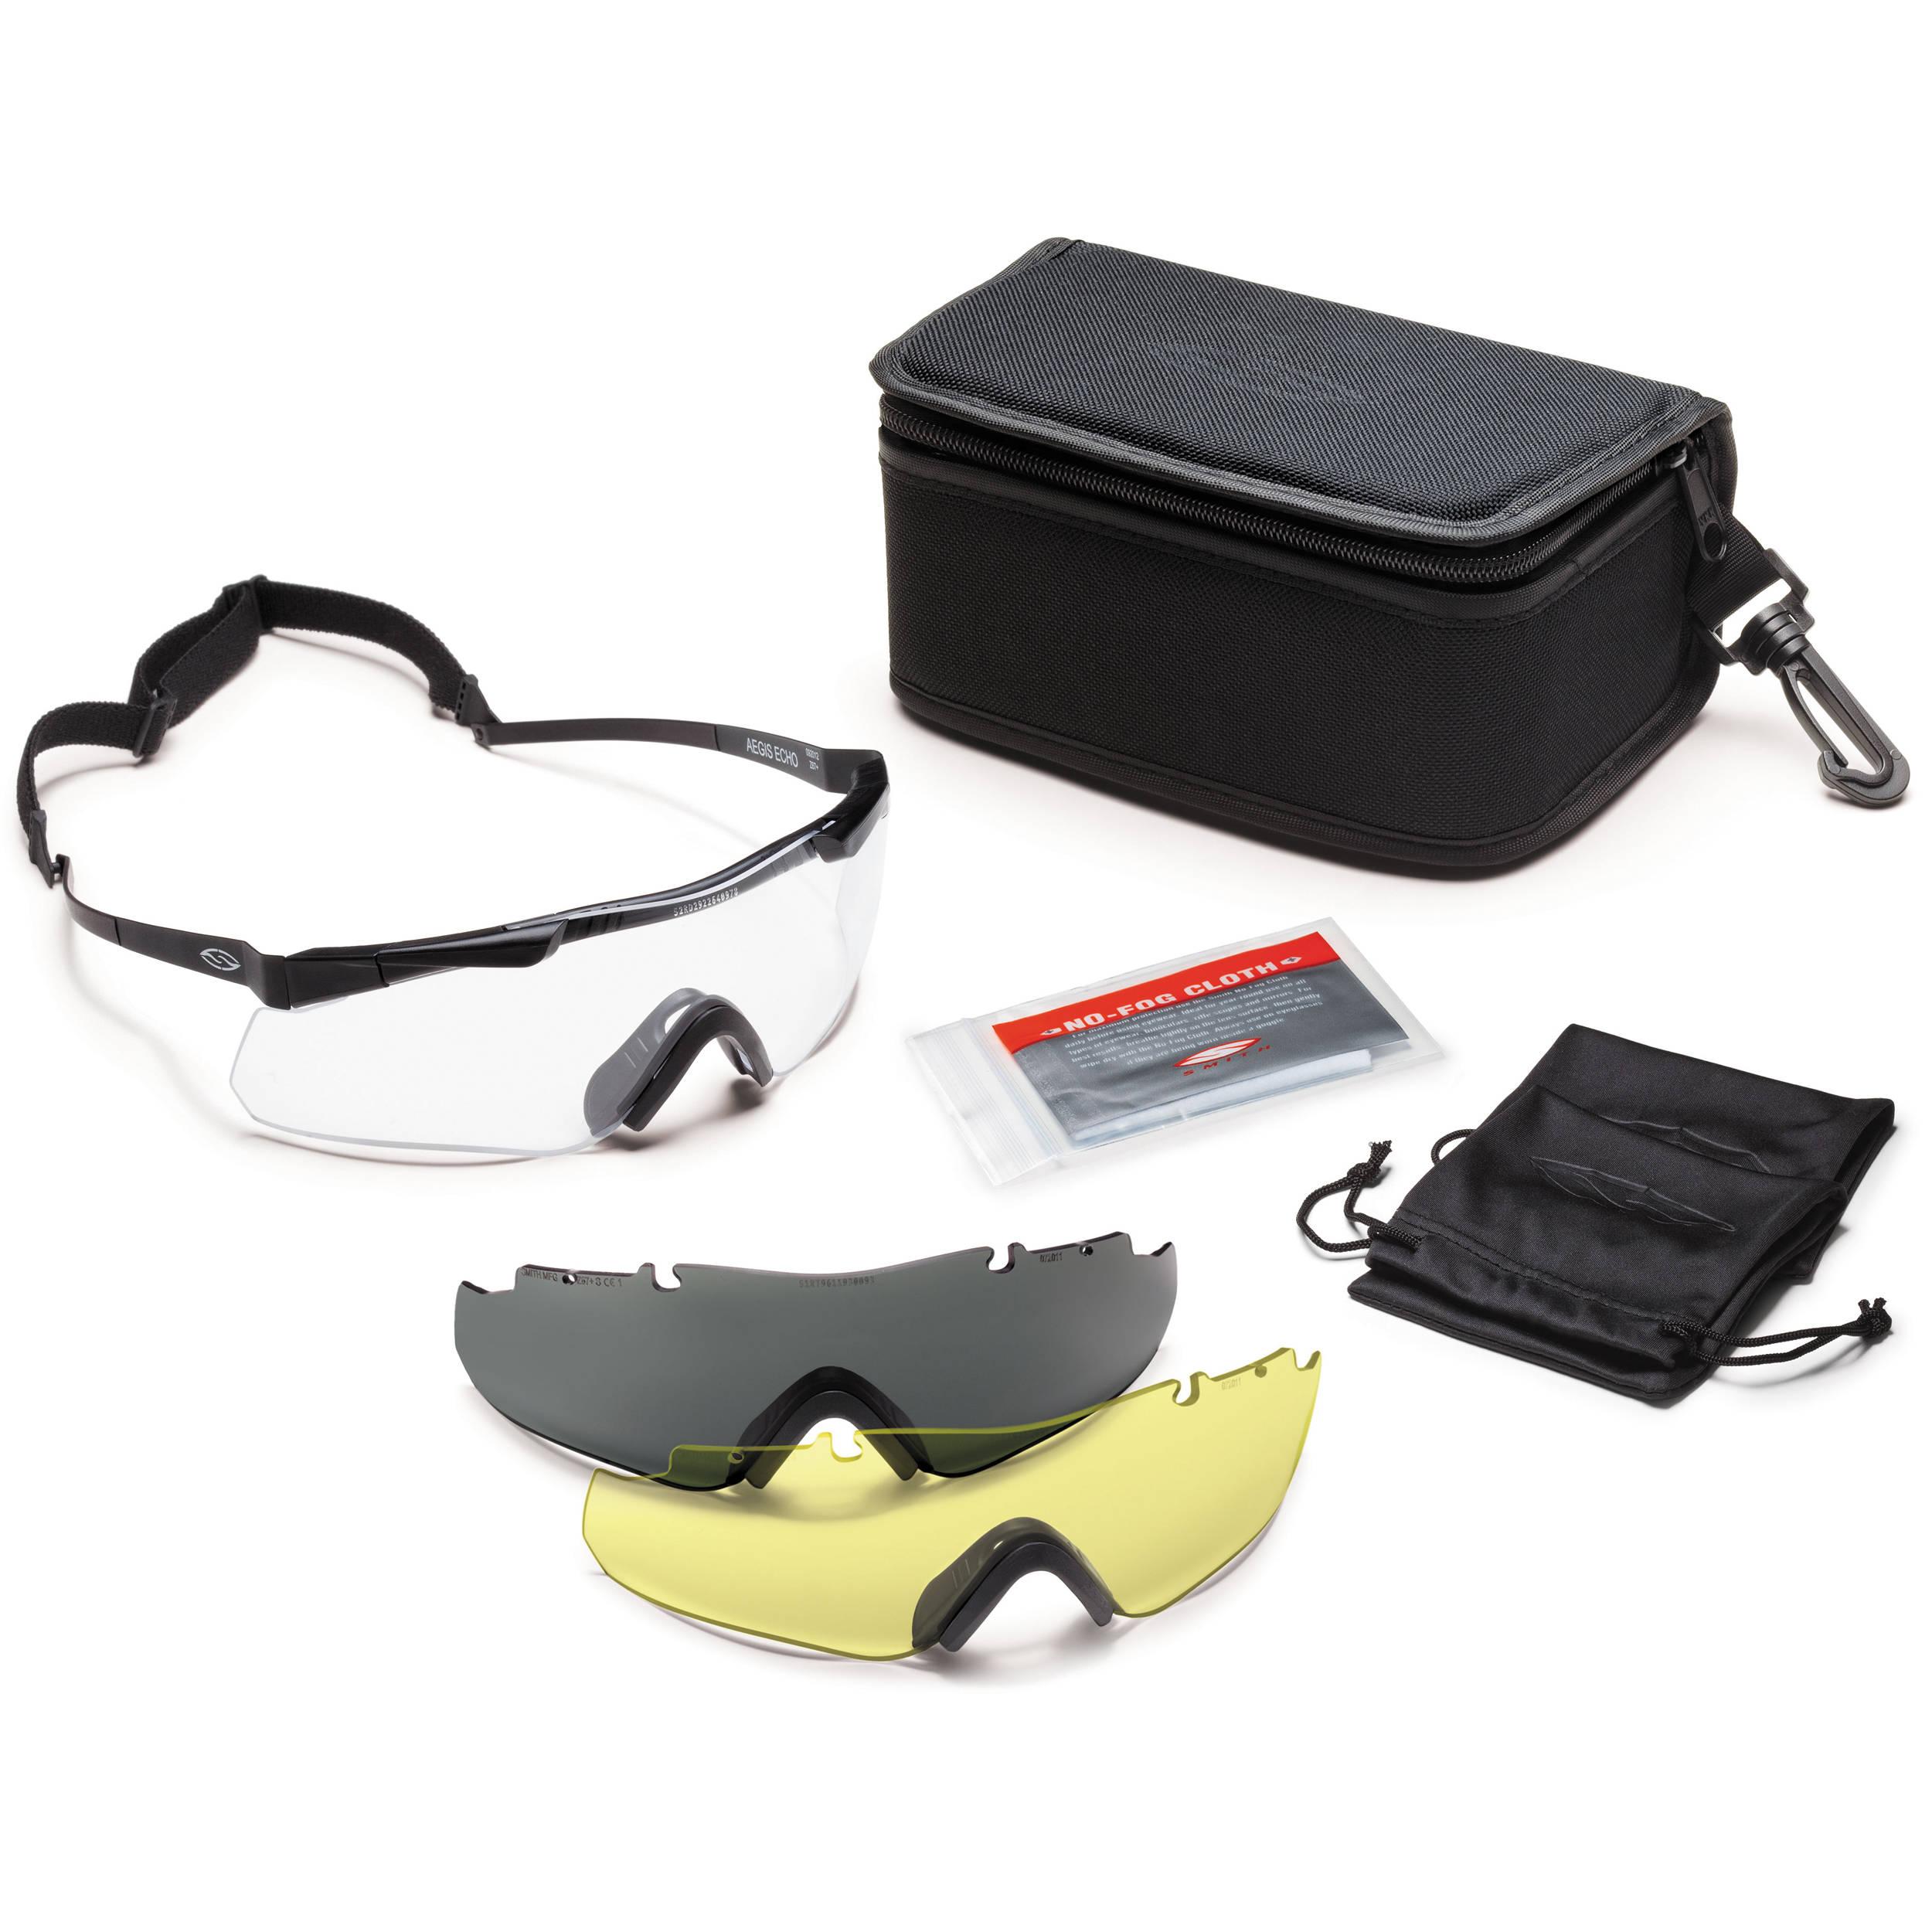 0f98d97161bd1 Smith Optics Aegis Echo Protective Eyewear - Deluxe AECHABK12-3R